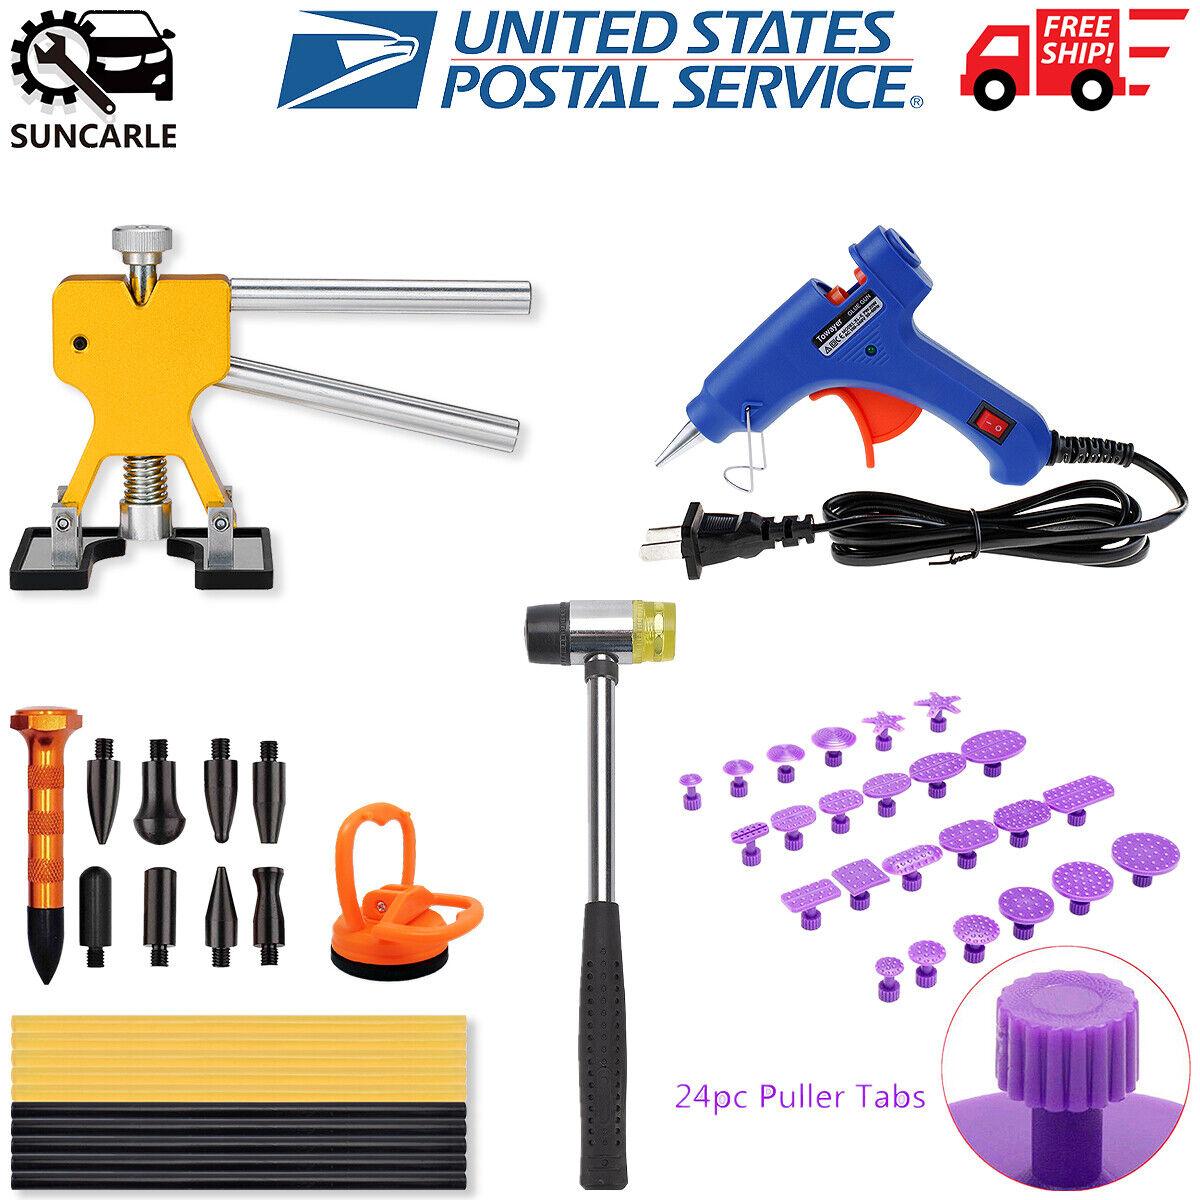 US Car Dent Puller Tools Paintless Hail Damage Dent Removal Repair Tools Kits